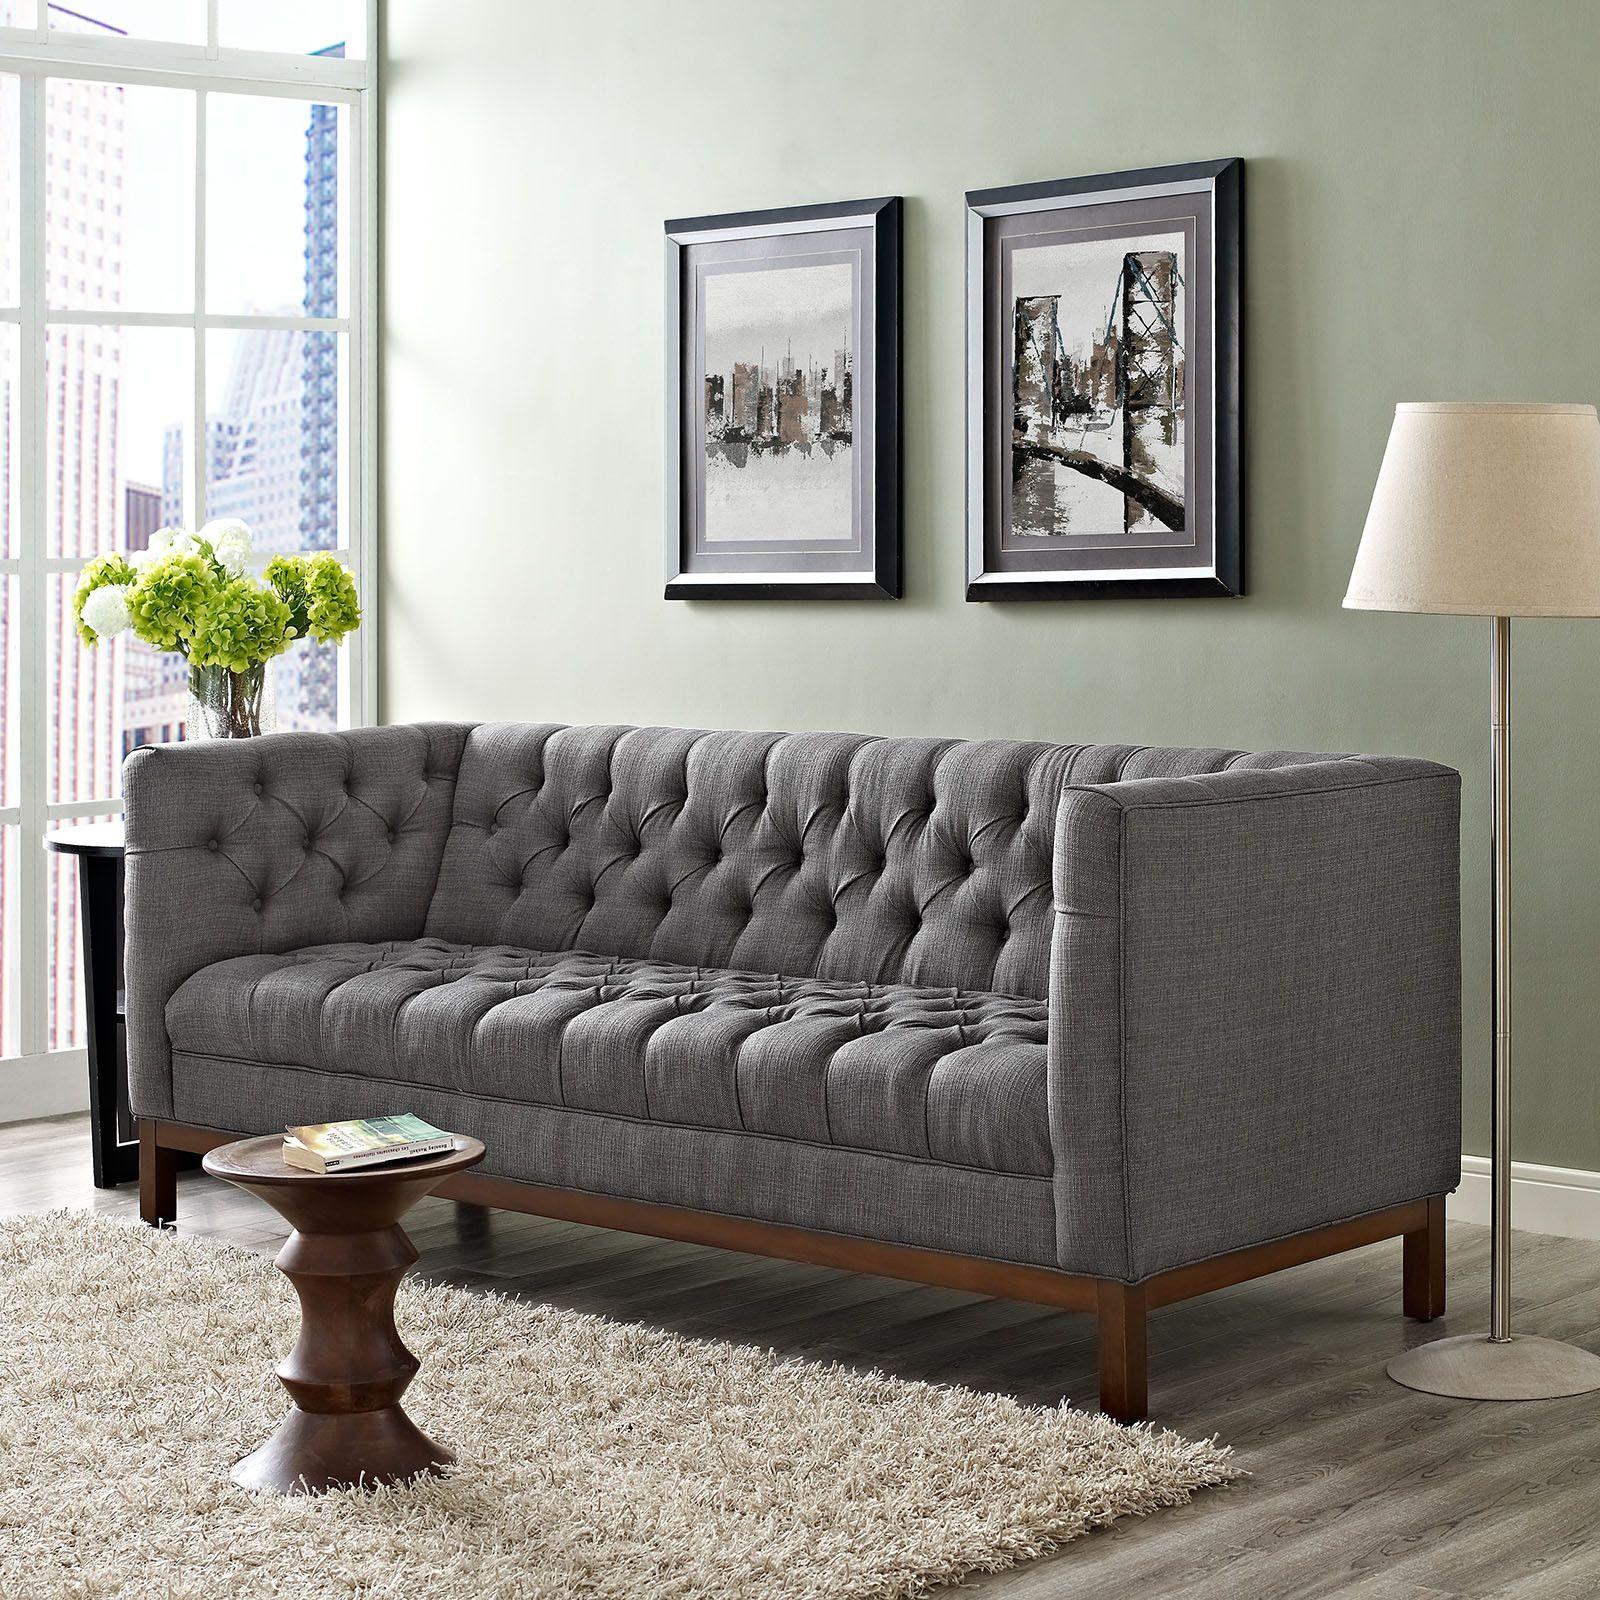 Paramour fabric sofa gray home furniture pinterest home gray